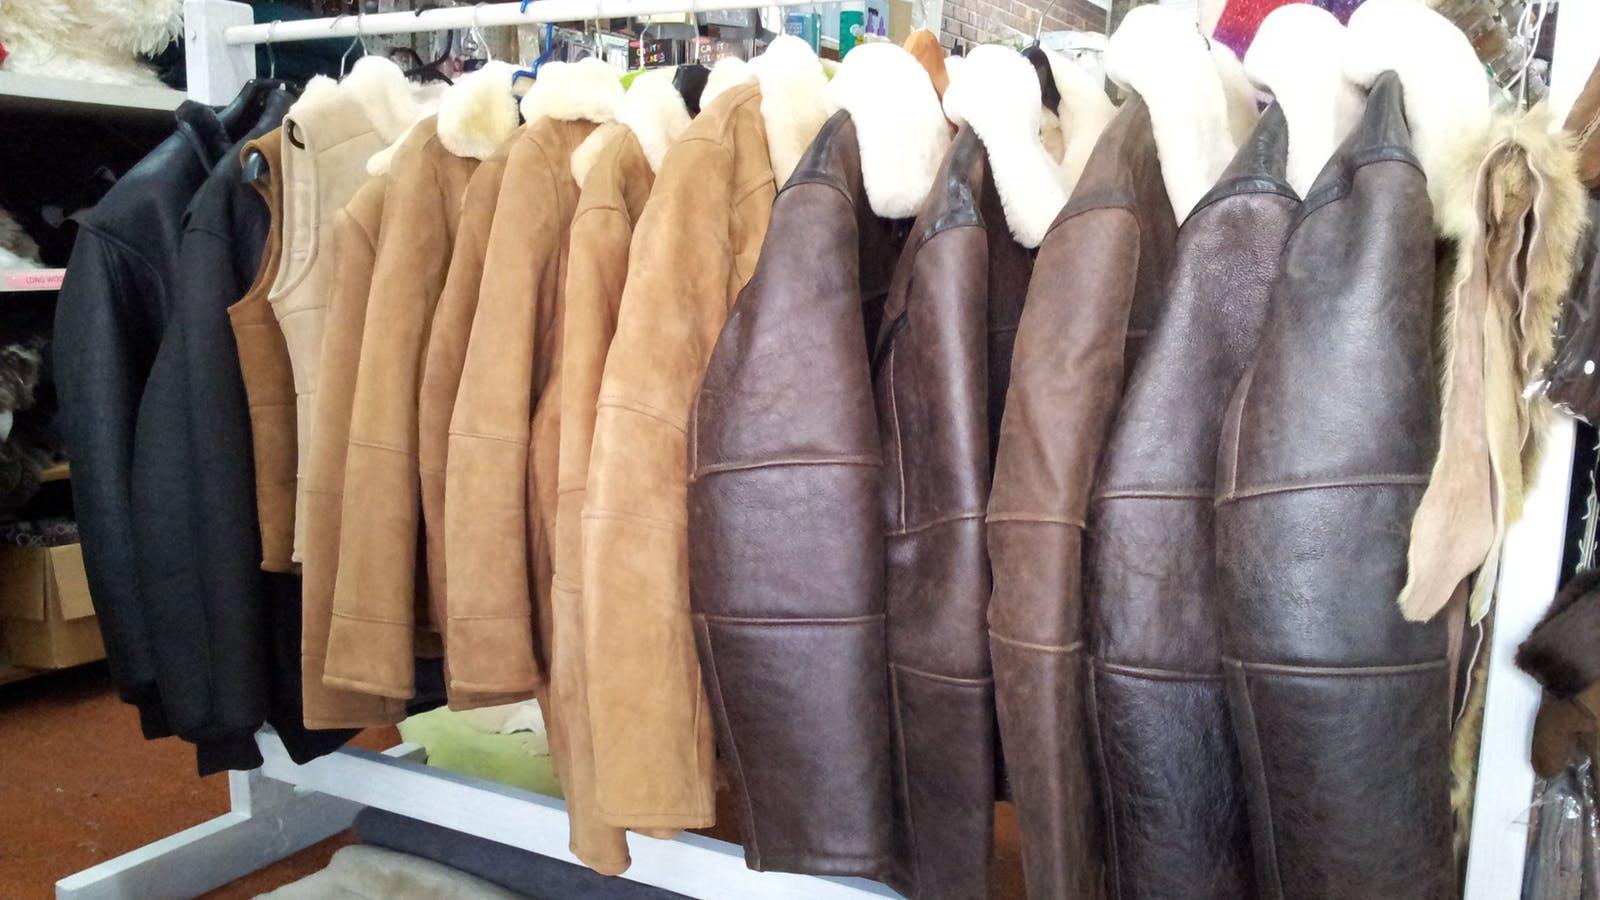 Sheepskin Coats and Vests on rack